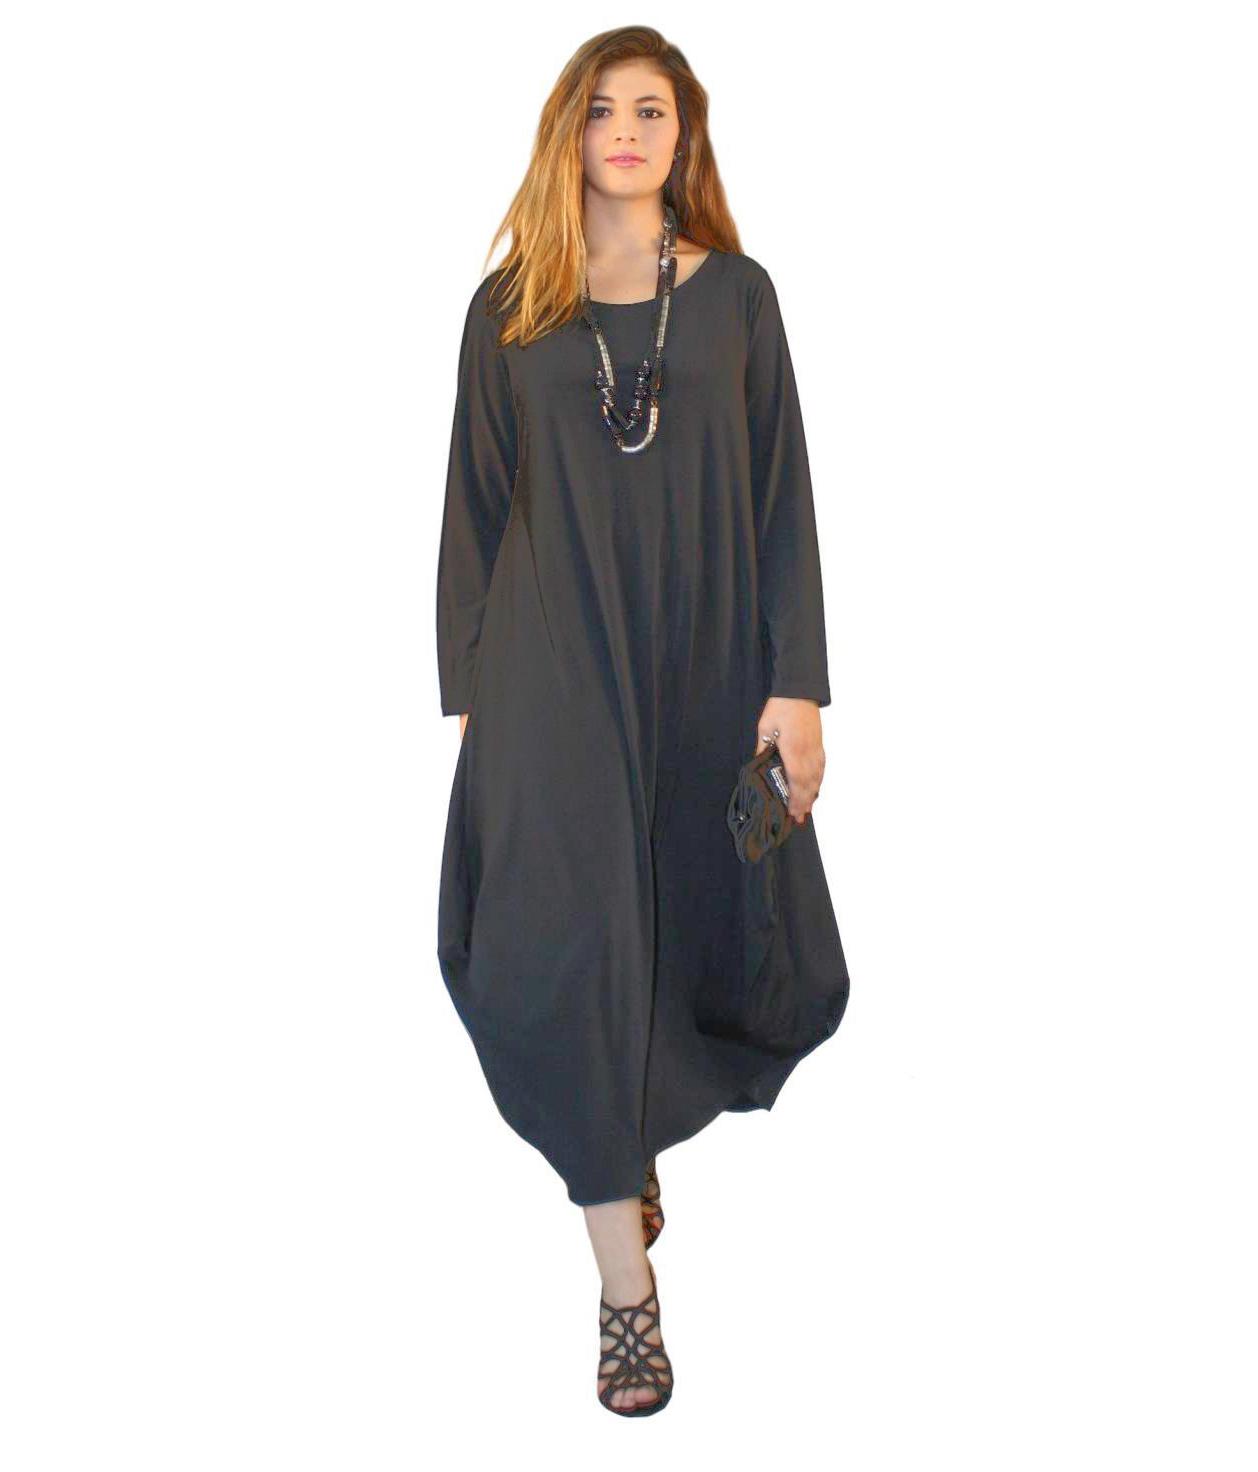 одежда онлайн самая дешевая доставка